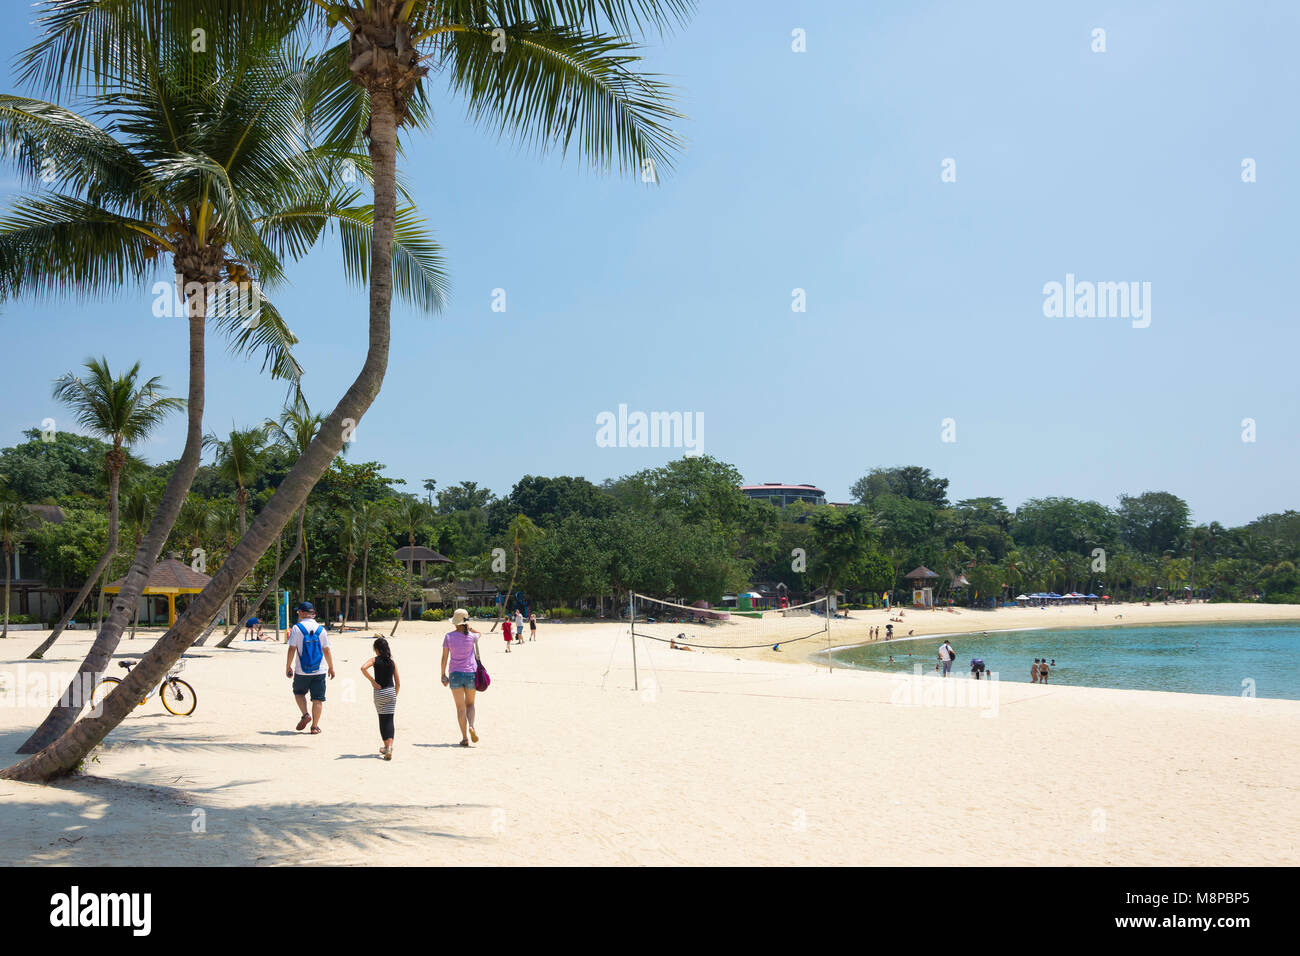 Palawan Beach, Sentosa Island, Central Region, Singapore Island (Pulau Ujong), Singapore - Stock Image